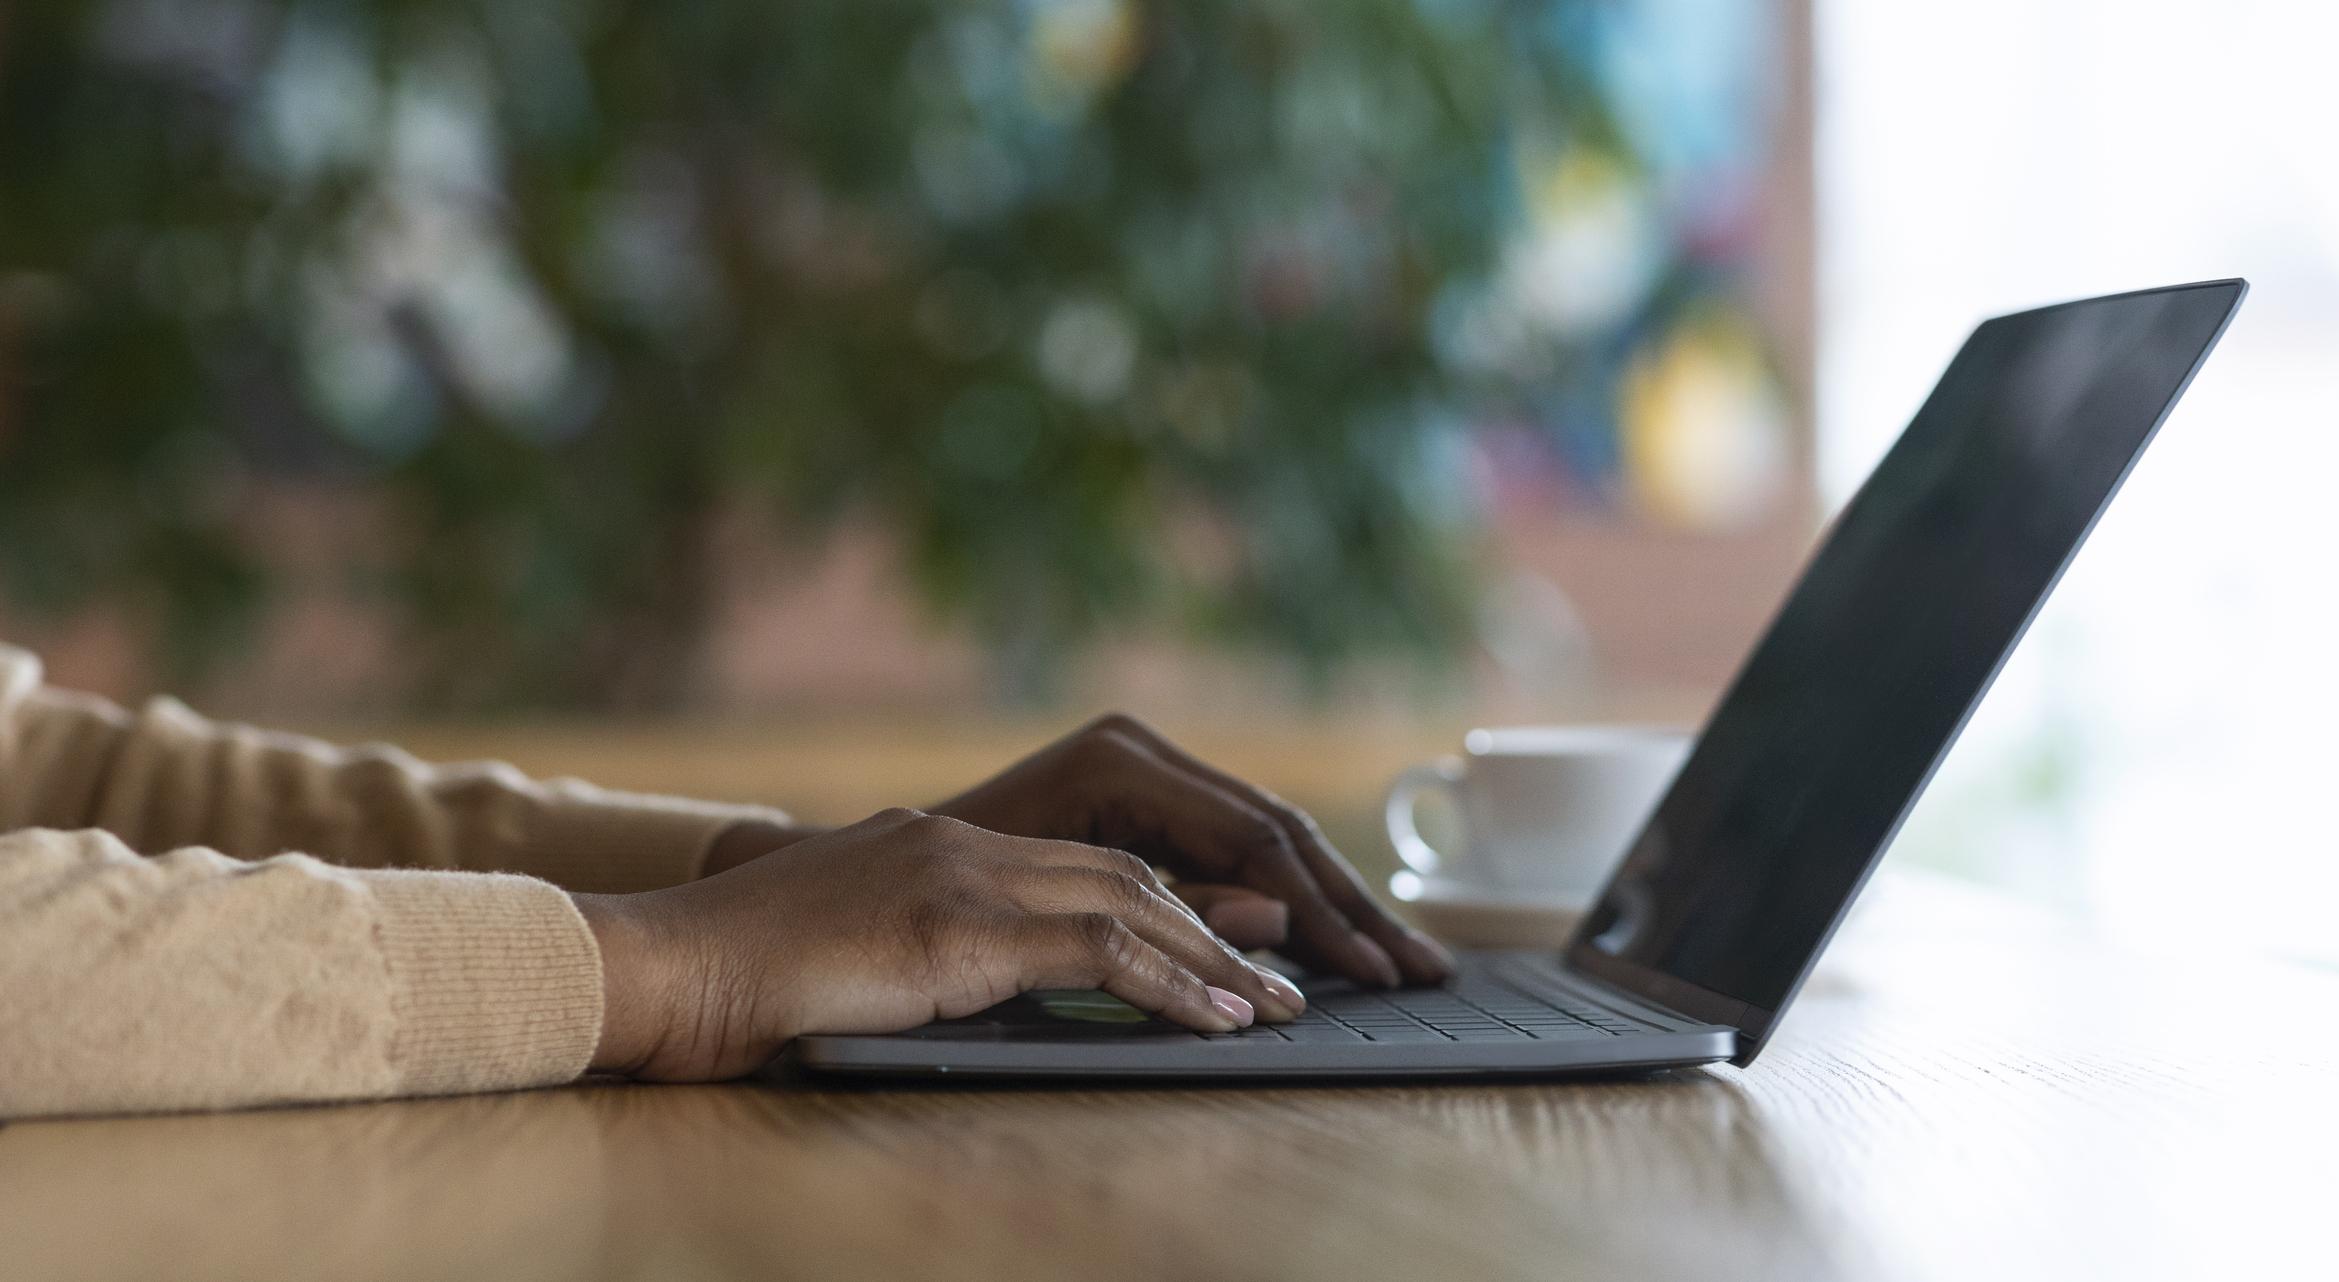 Hands of black girl typing on laptop keyboard, cafe interior